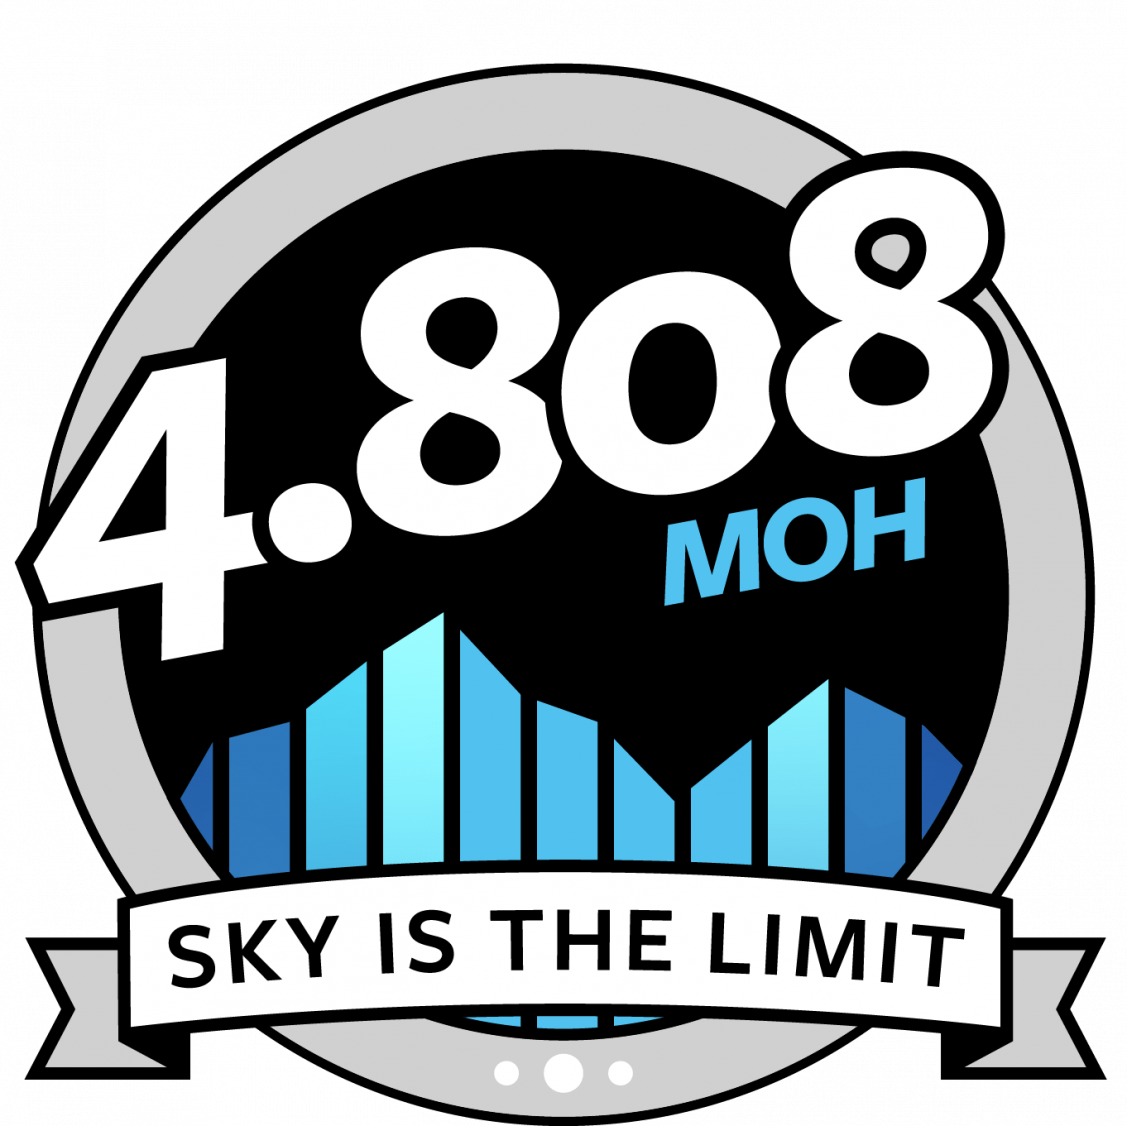 Sky is the Limit 2020 – 4808 meter